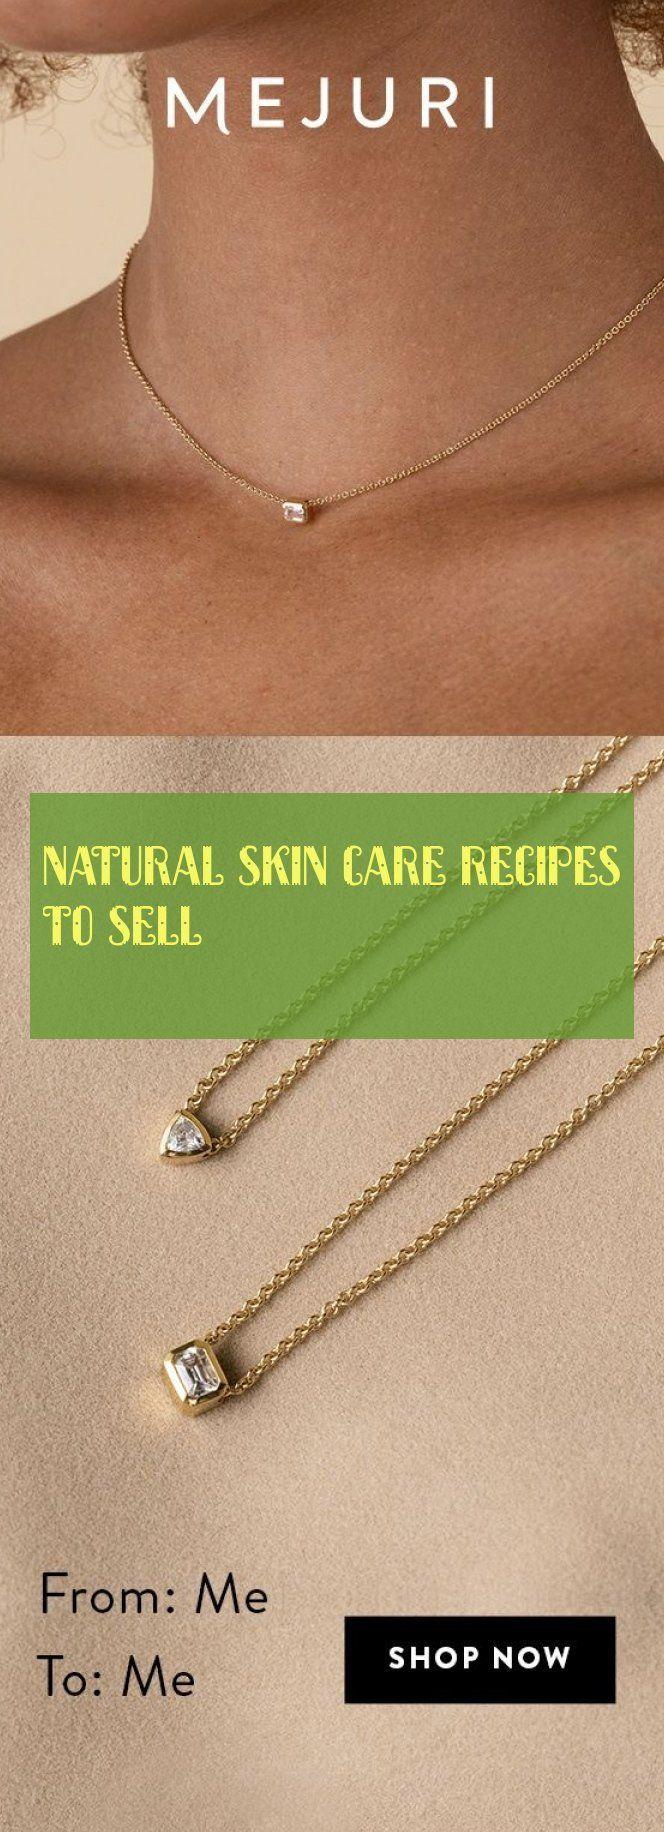 natural skin care recipes to sell – natürliche hautpflege rezepte zu verkaufen … 71ab6984e518d982af0c8a27957668e4